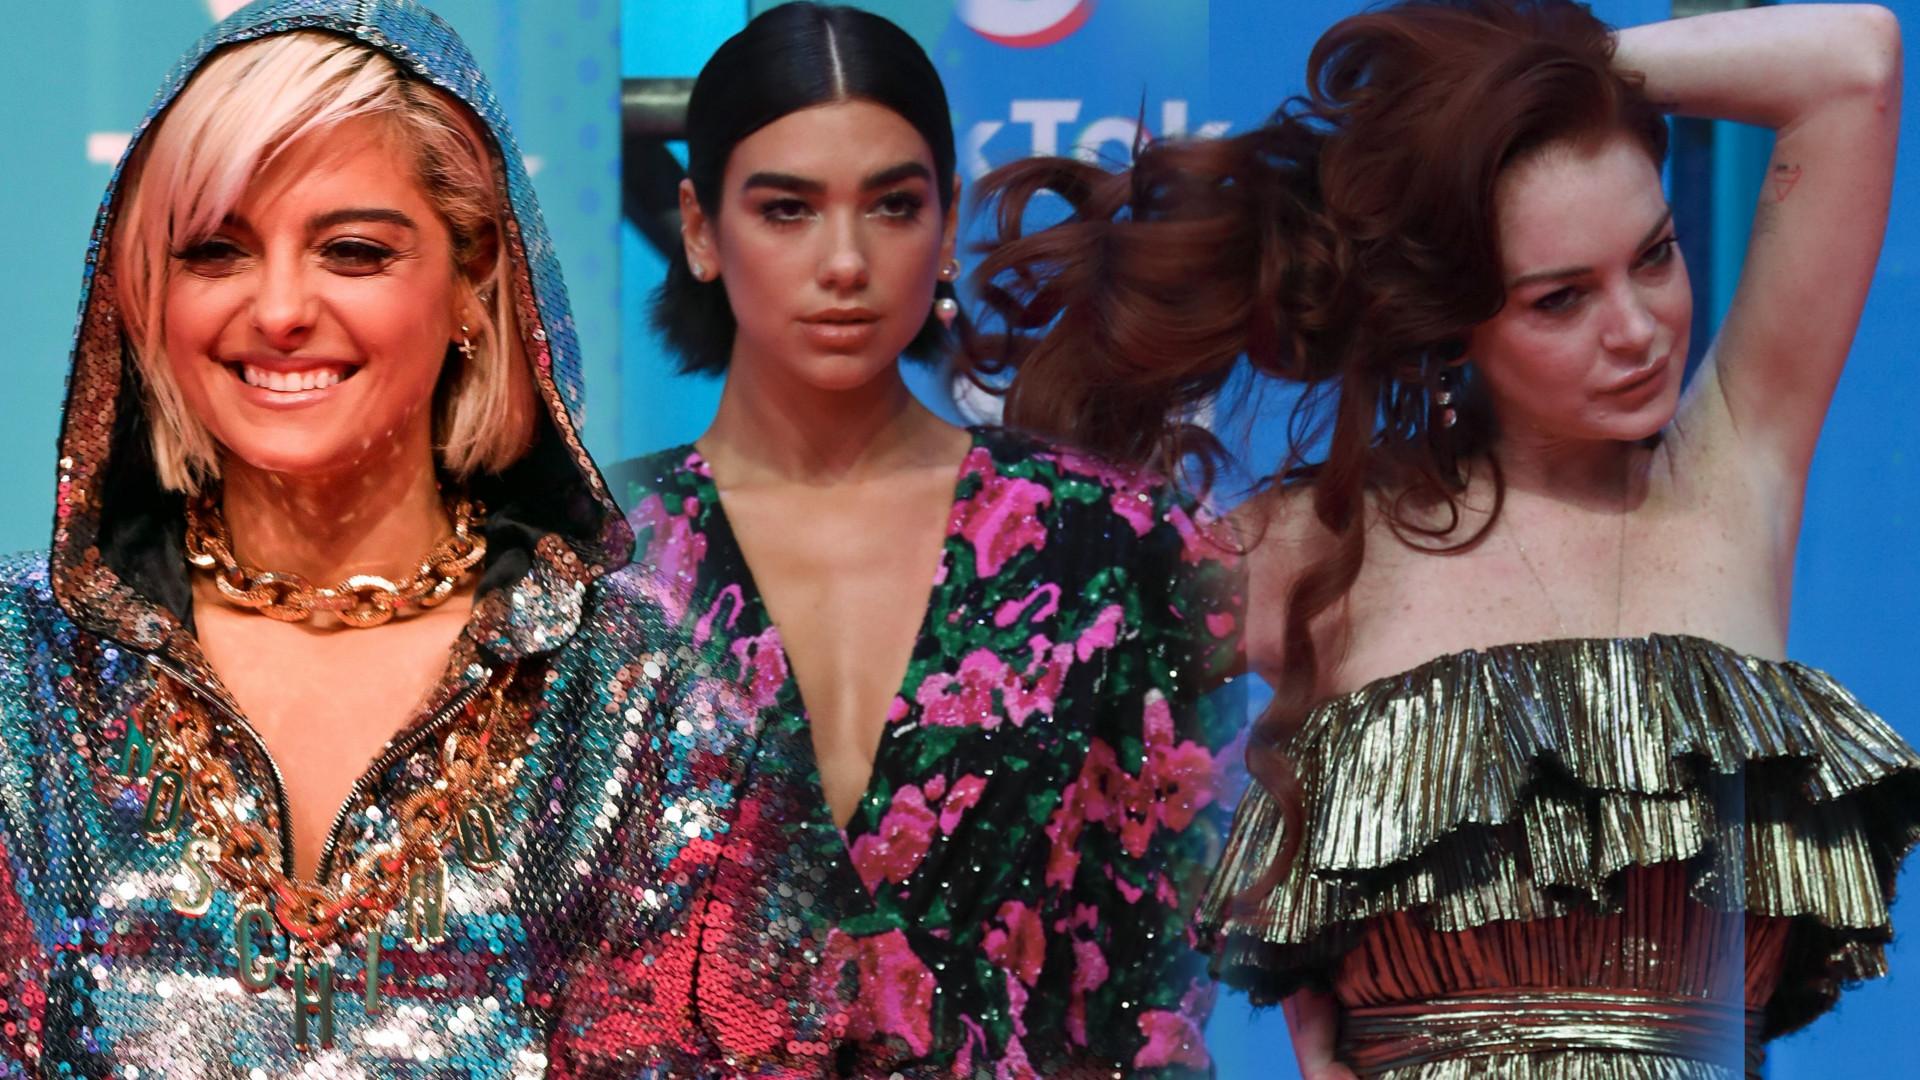 Camila Cabello, Dua Lipa i Nicki Minaj ze statuetkami MTV EMA 2018 (ZDJĘCIA)